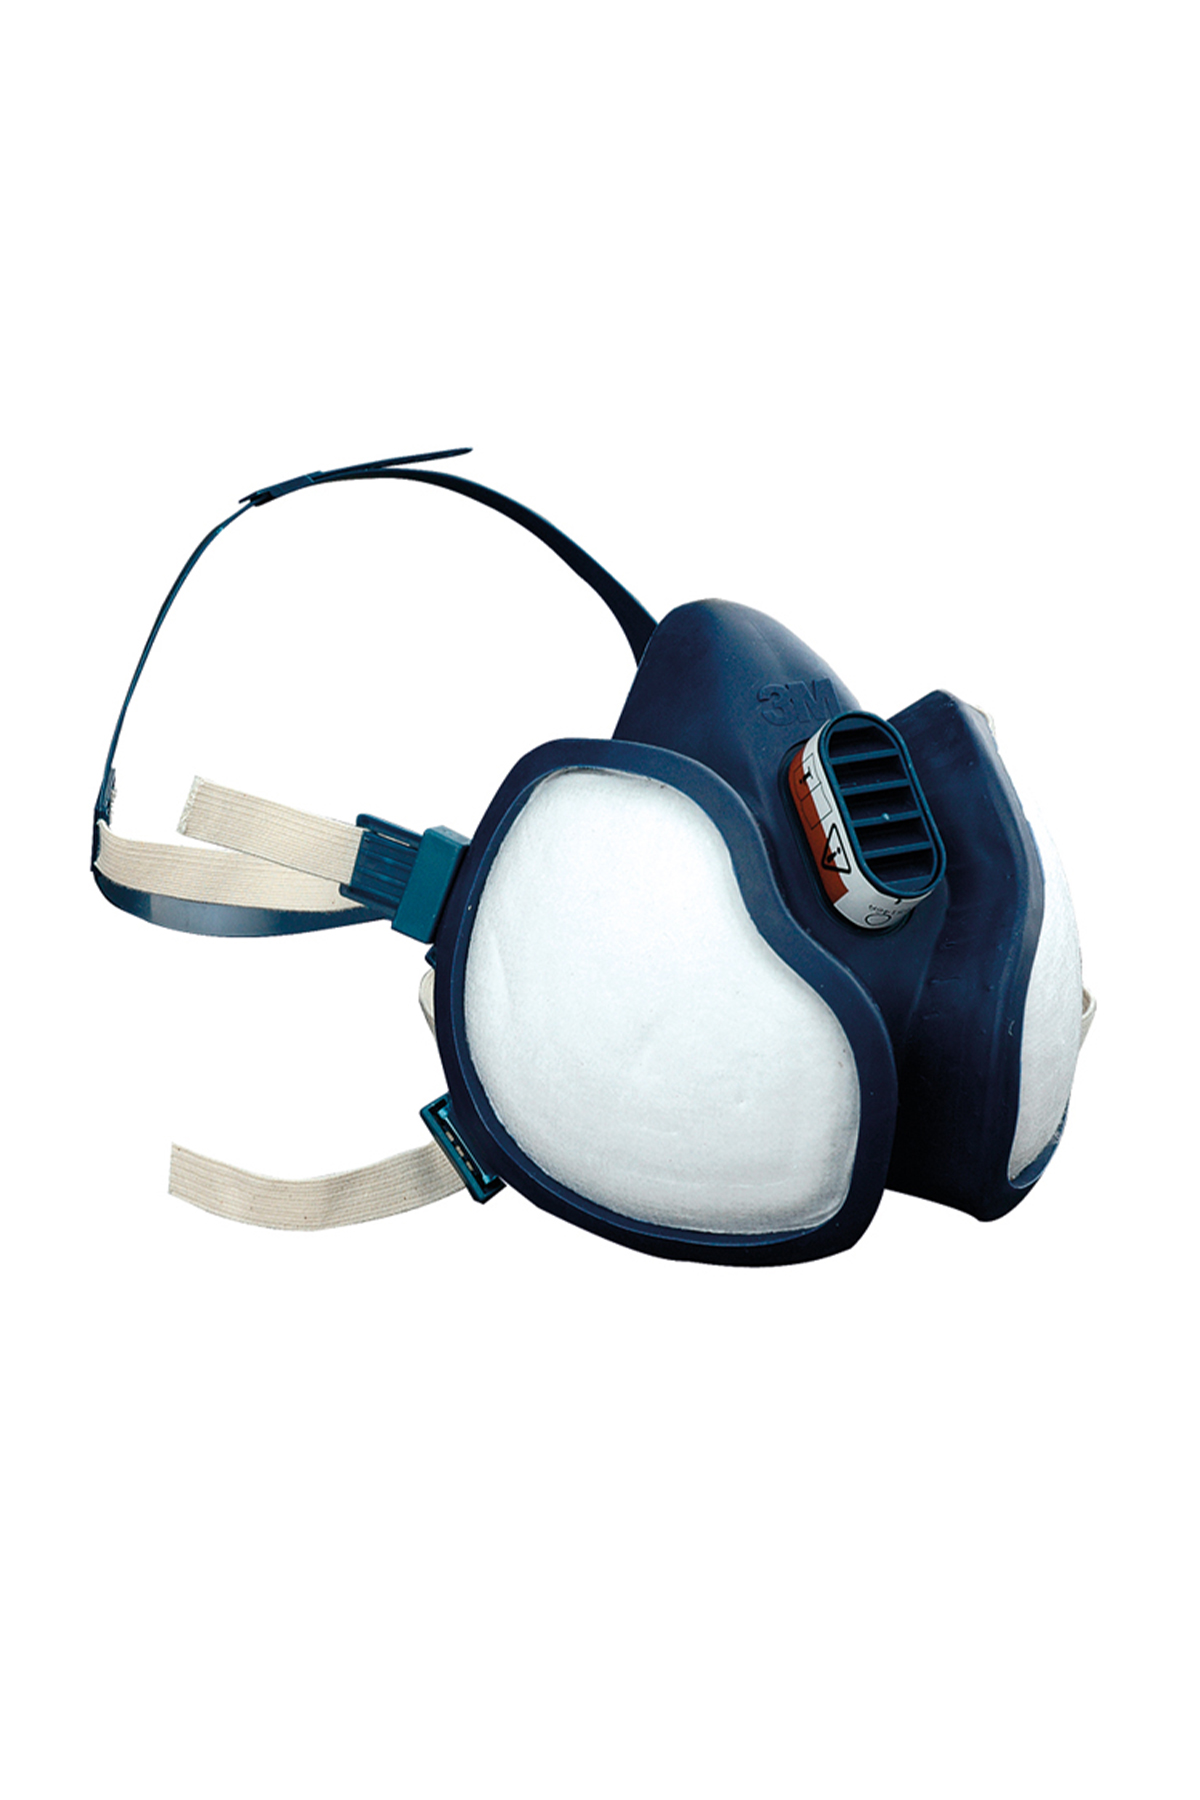 3m mascherine protettive